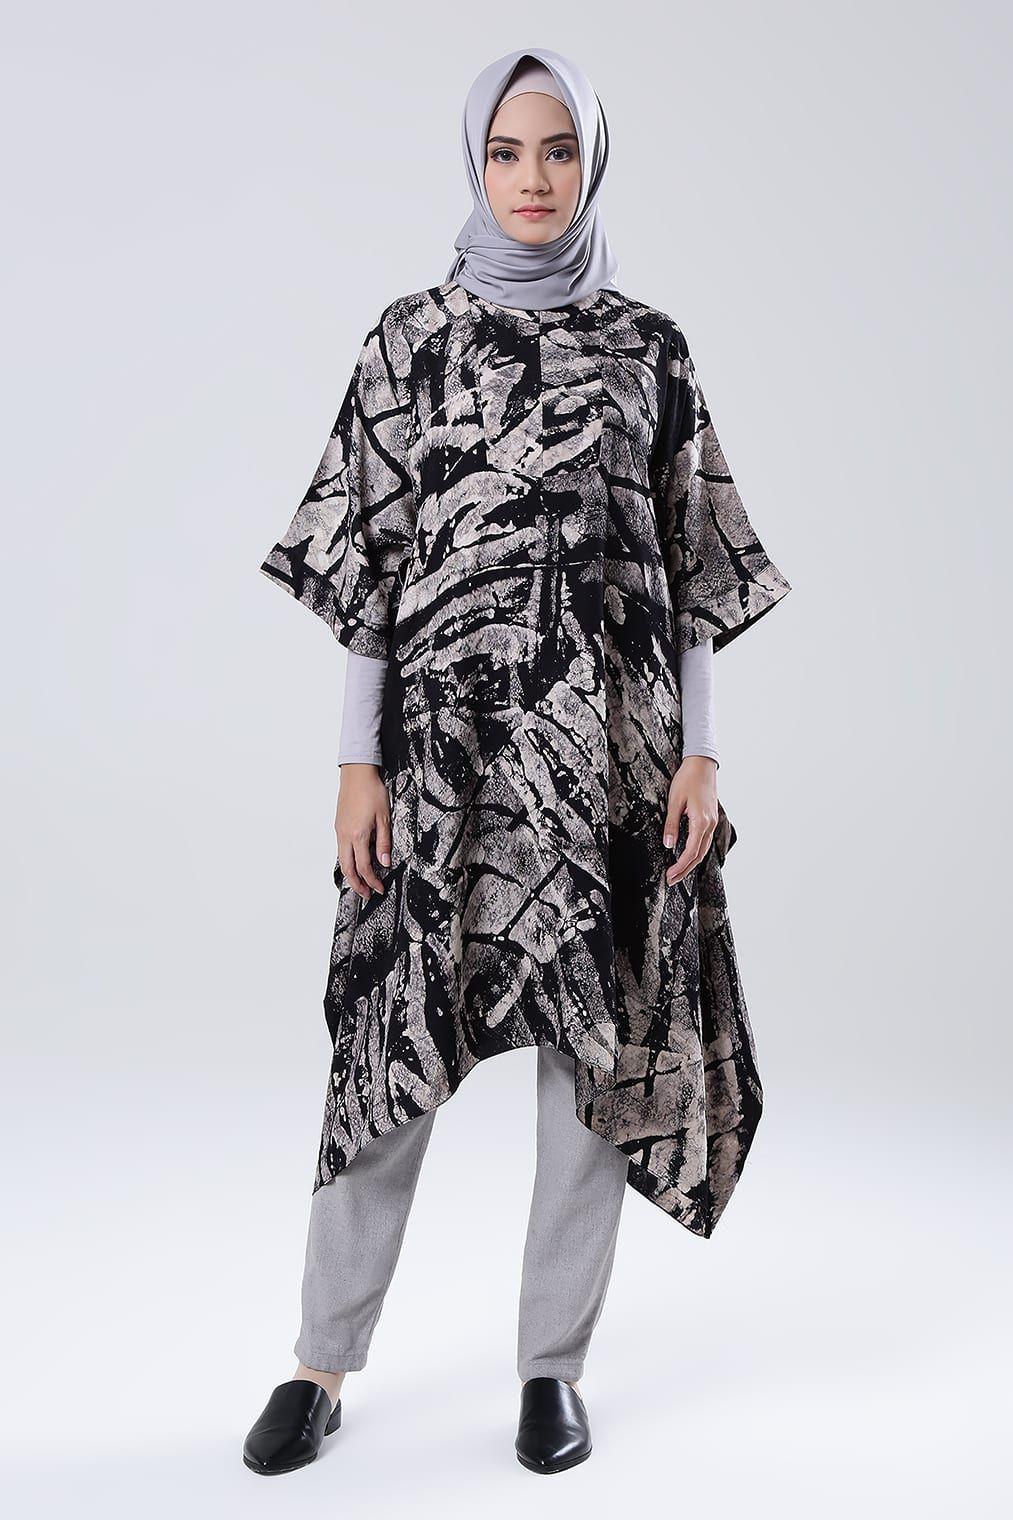 Blackcreme dresses pinterest tunics butterfly and black